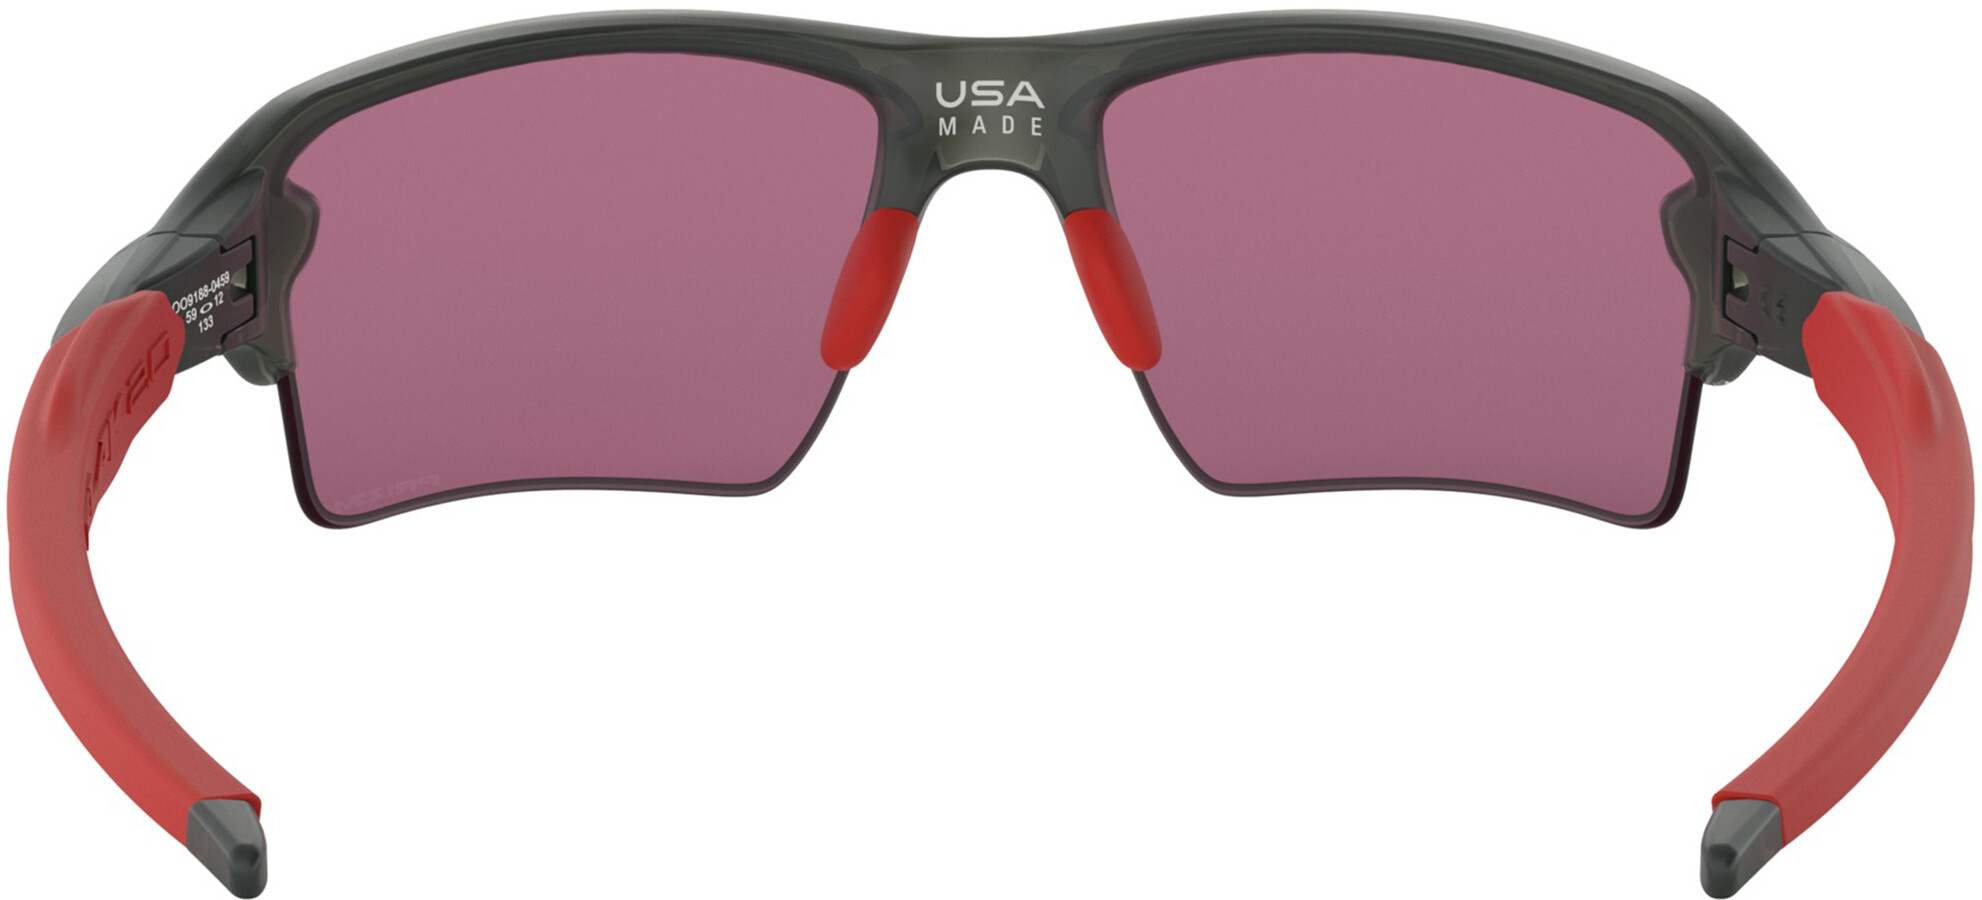 09506eaa07 Oakley Flak 2.0 XL Bike Glasses Men red black at Bikester.co.uk